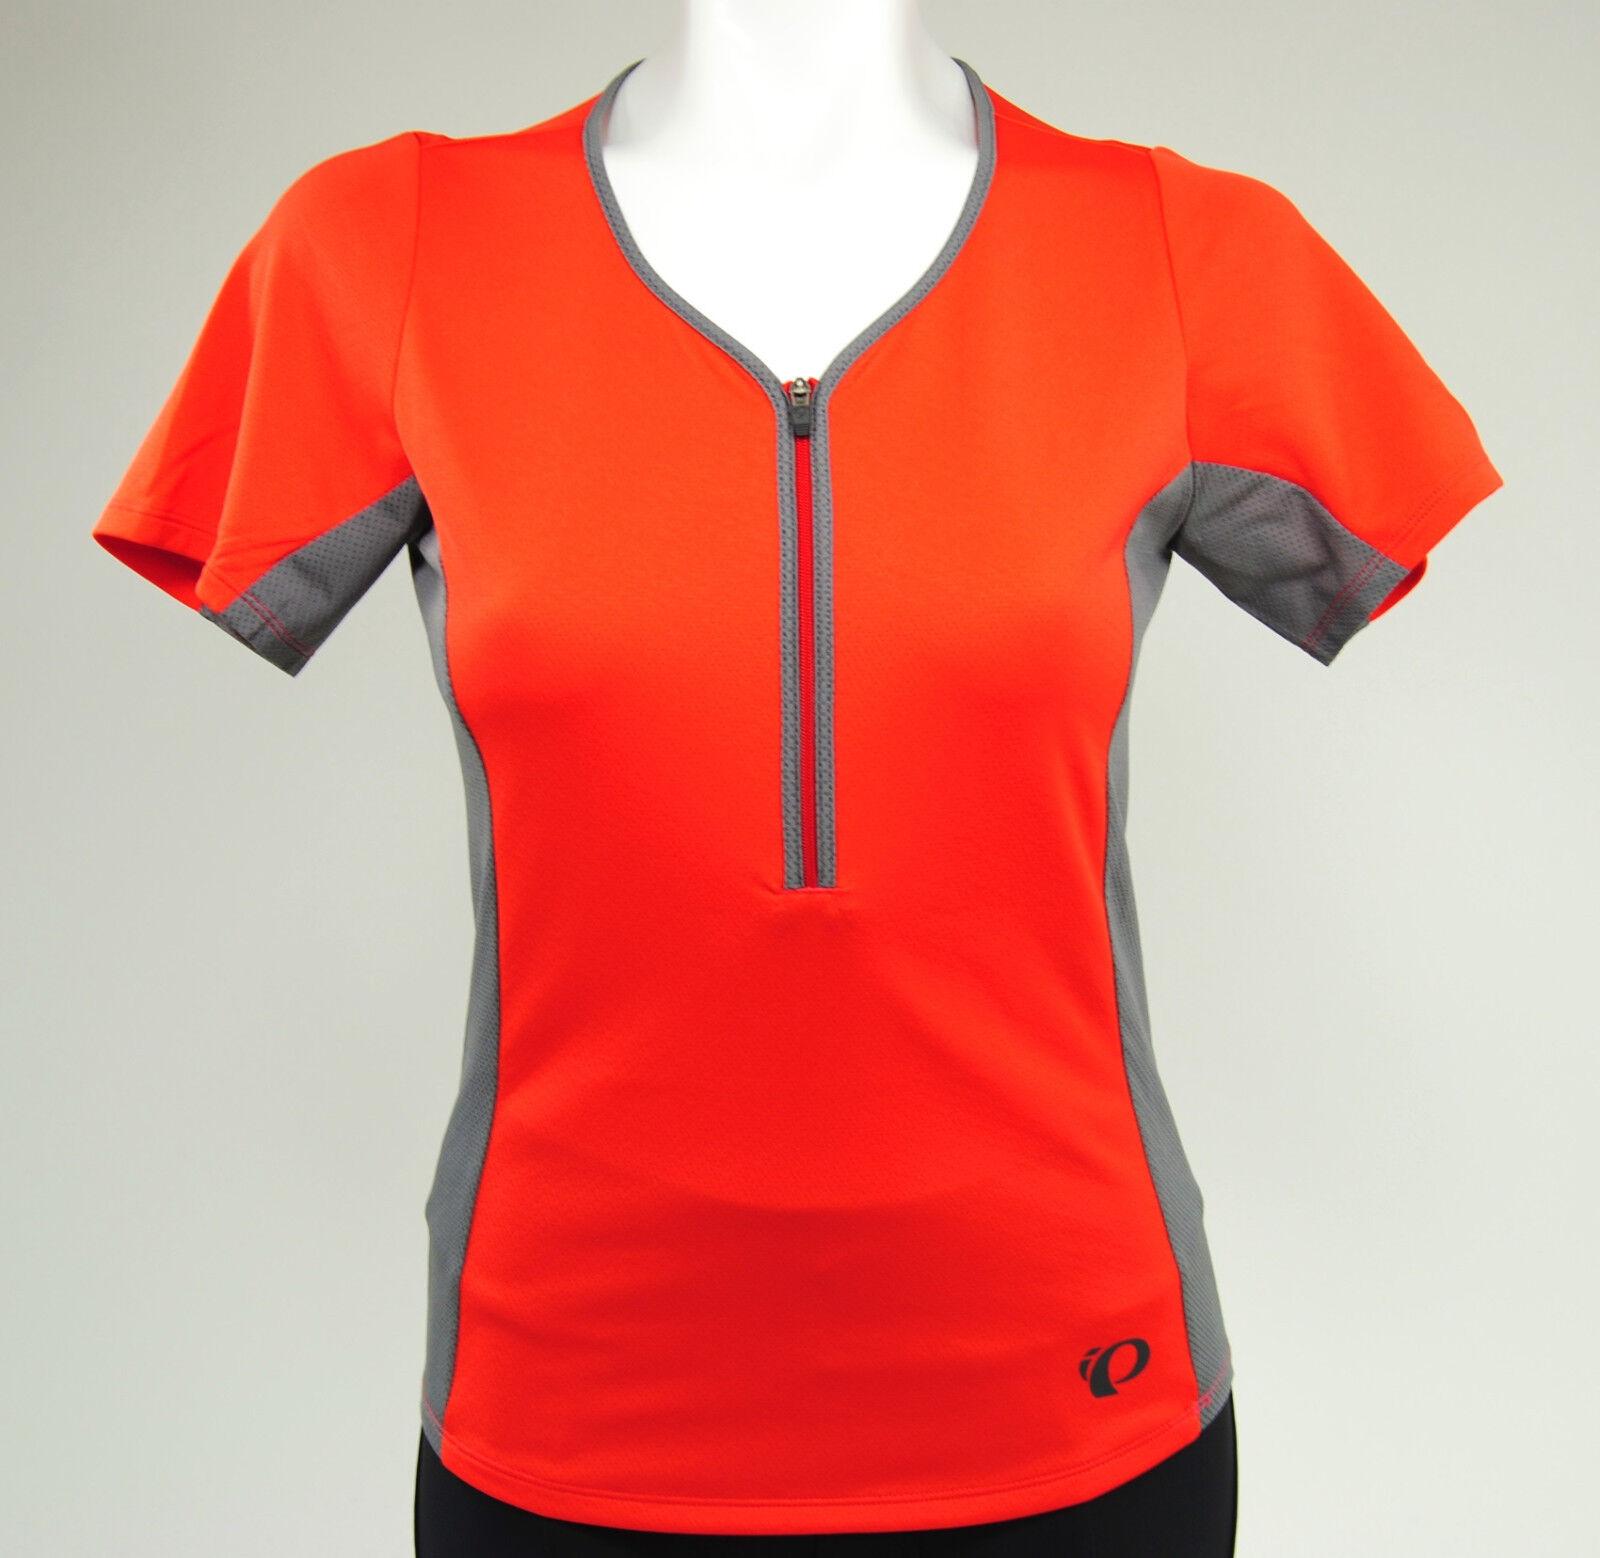 Pearl Izumi Women's Canyon Cycling Jersey, Poppy Red Smoked Pearl, Size XXL